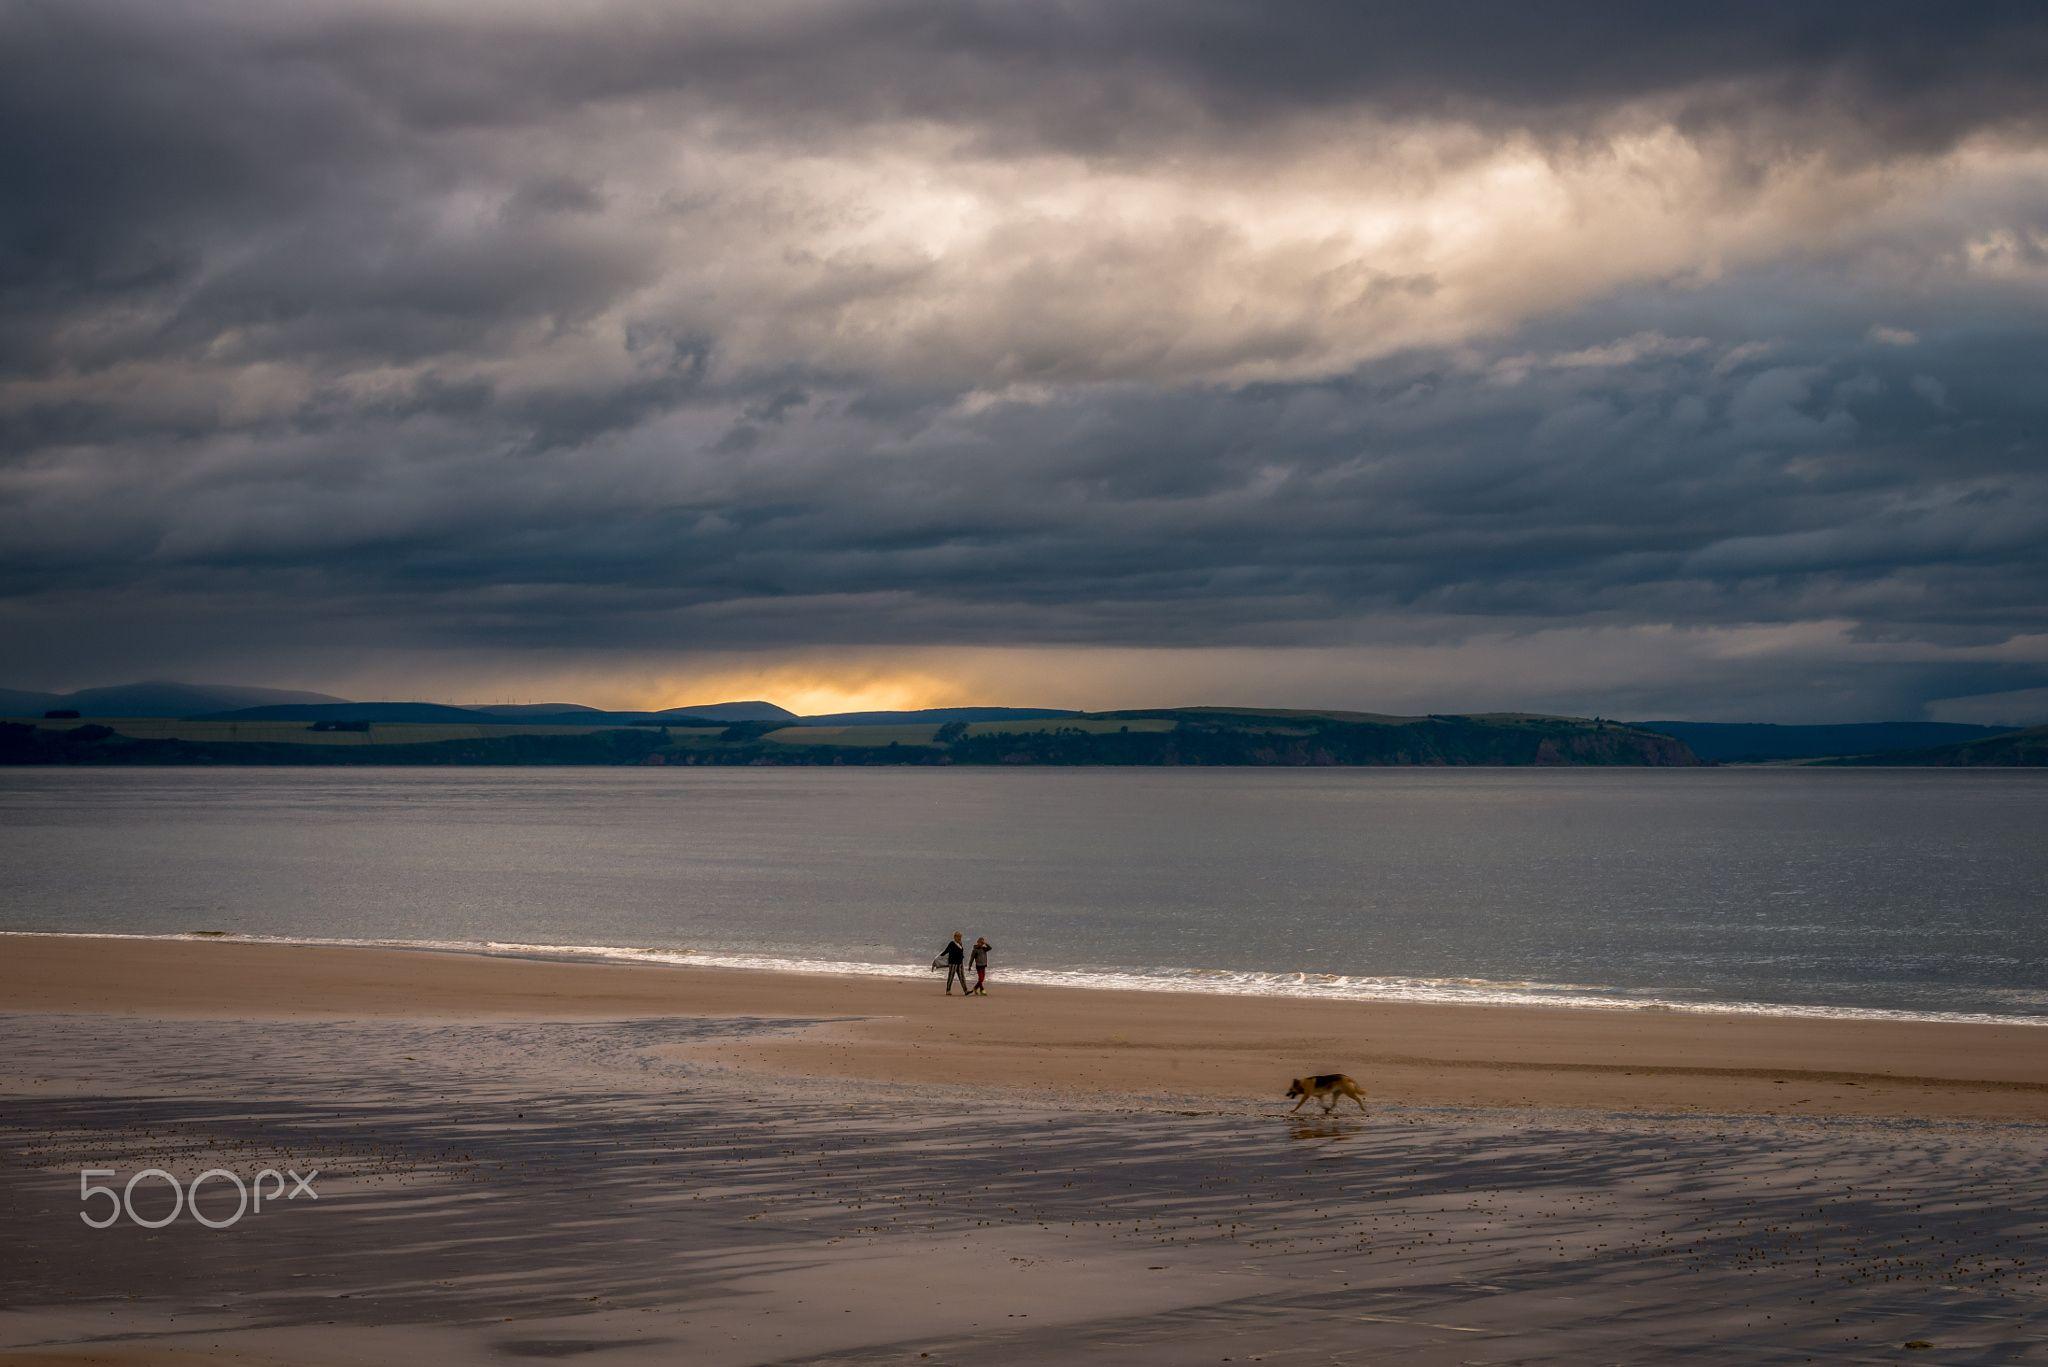 Walking the Dog - still dreaming of Scotland!